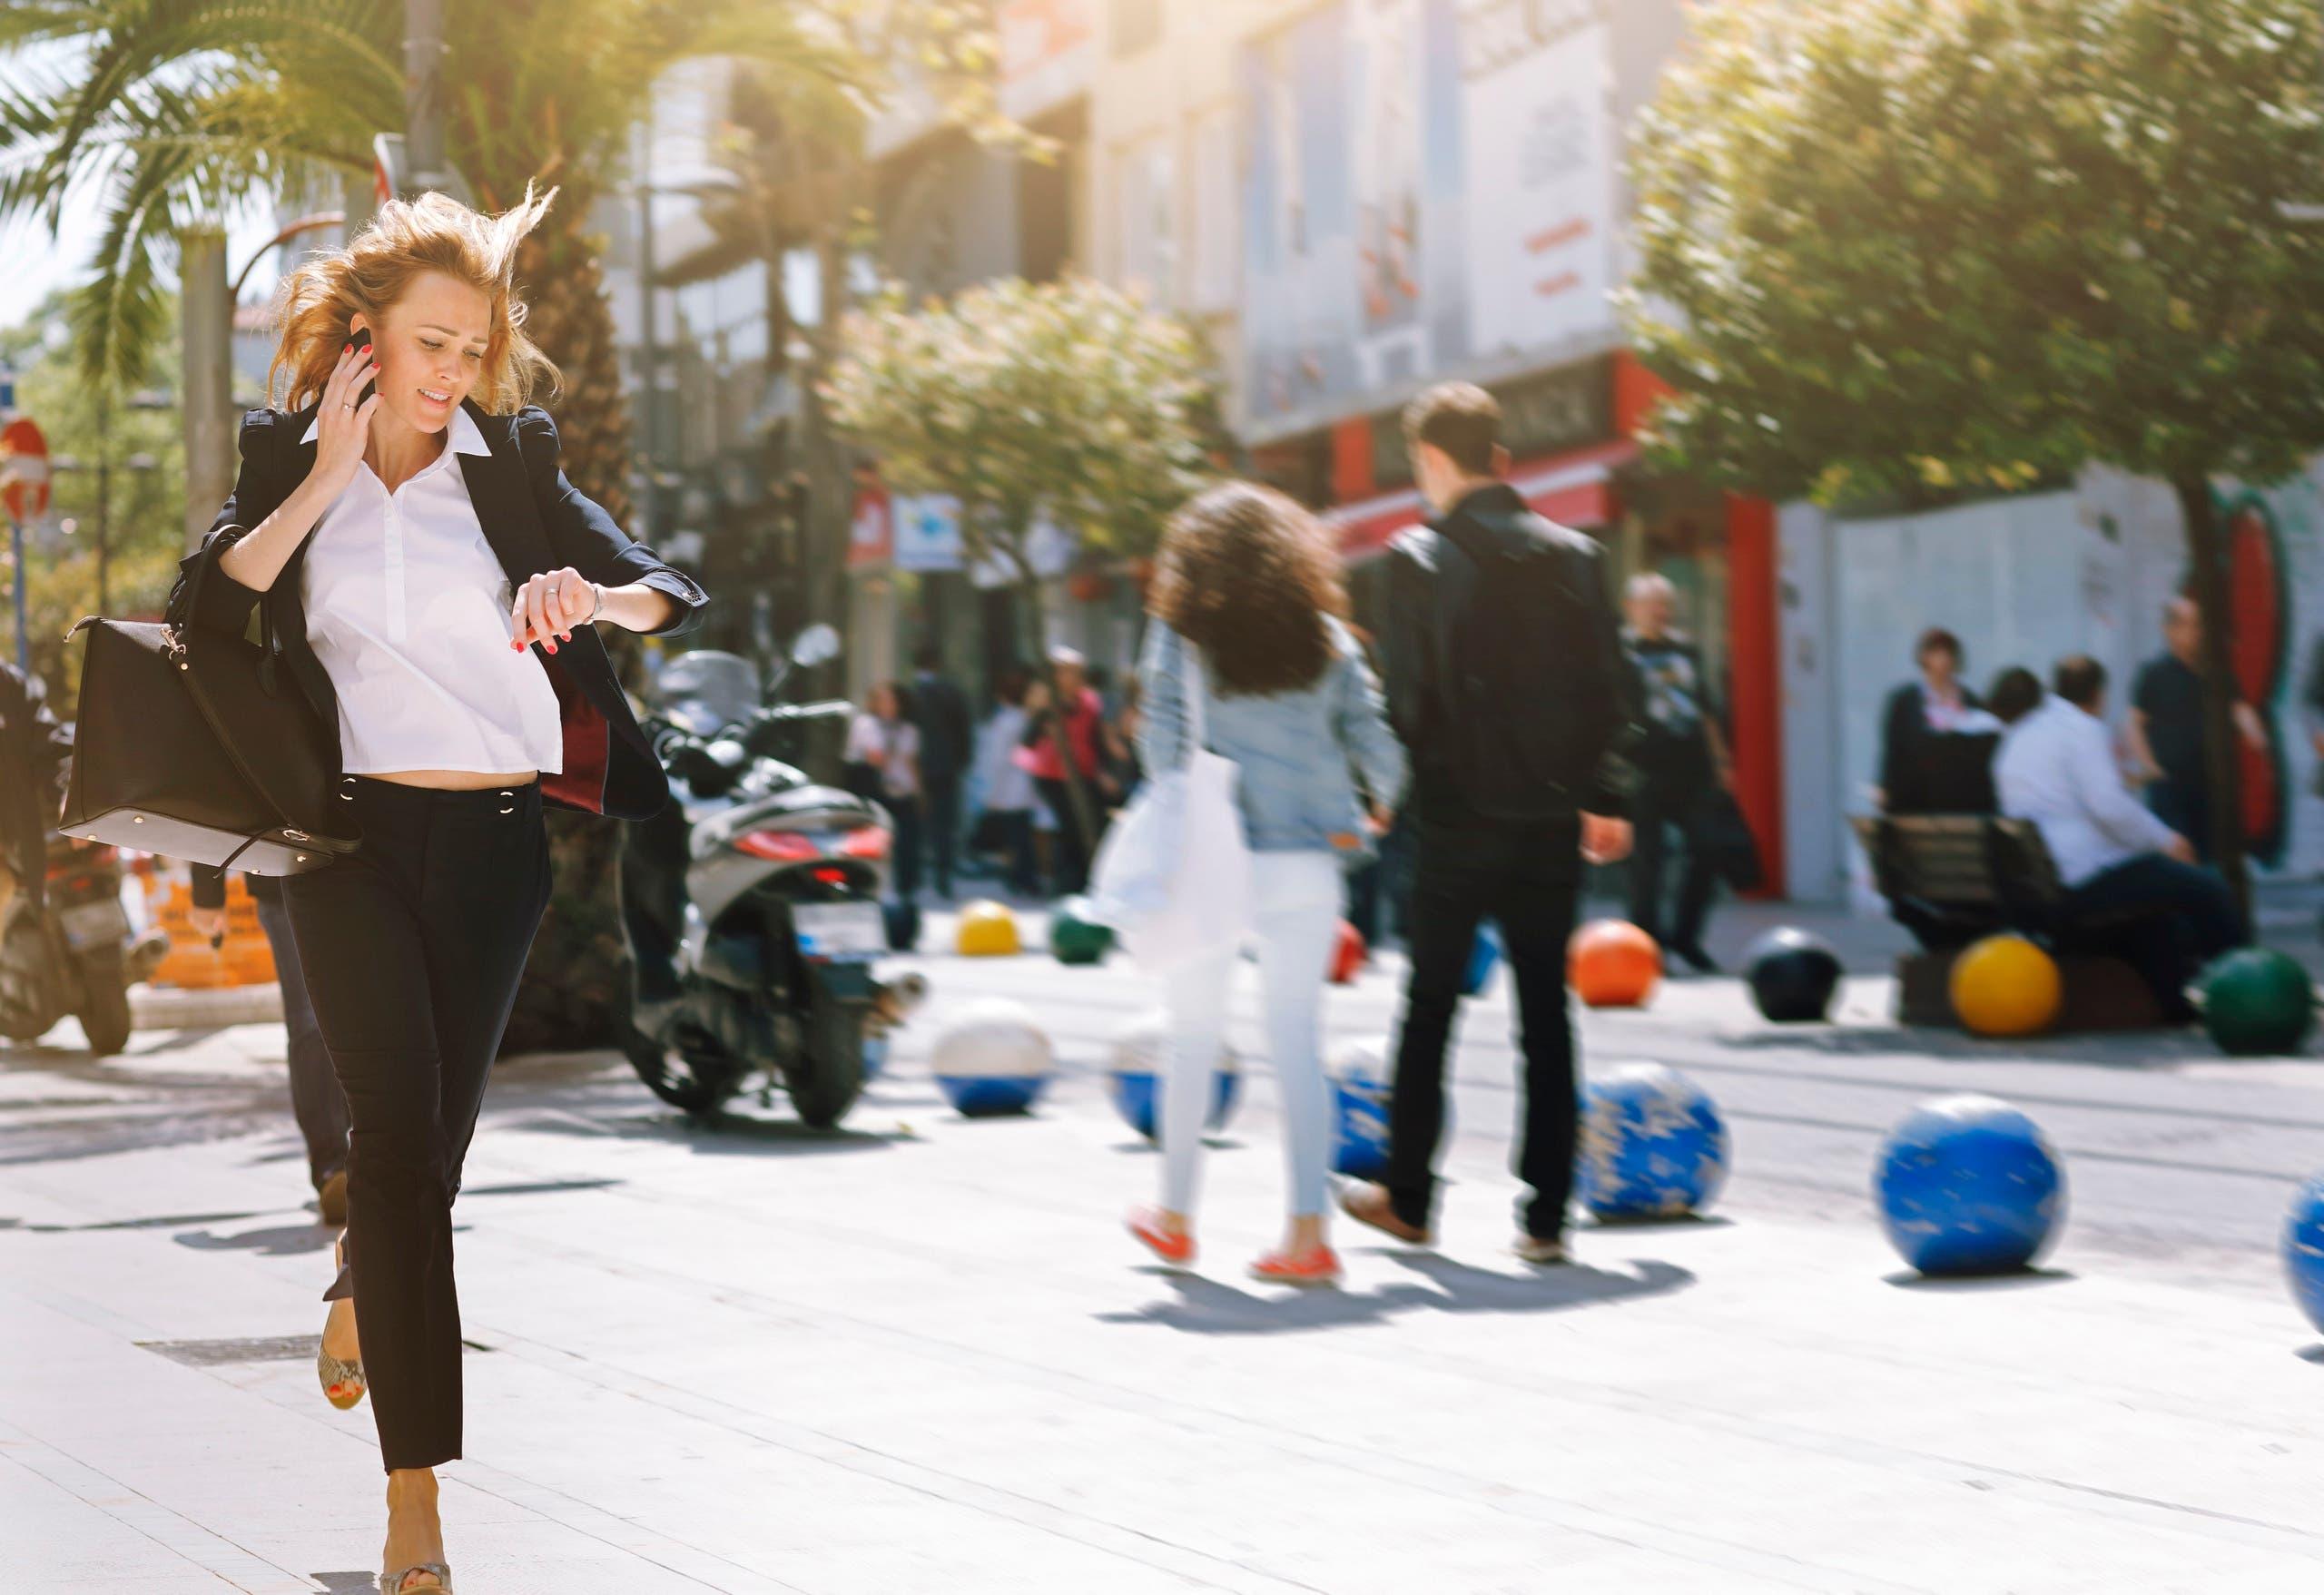 Business woman rushing to work running late. (Stock image)